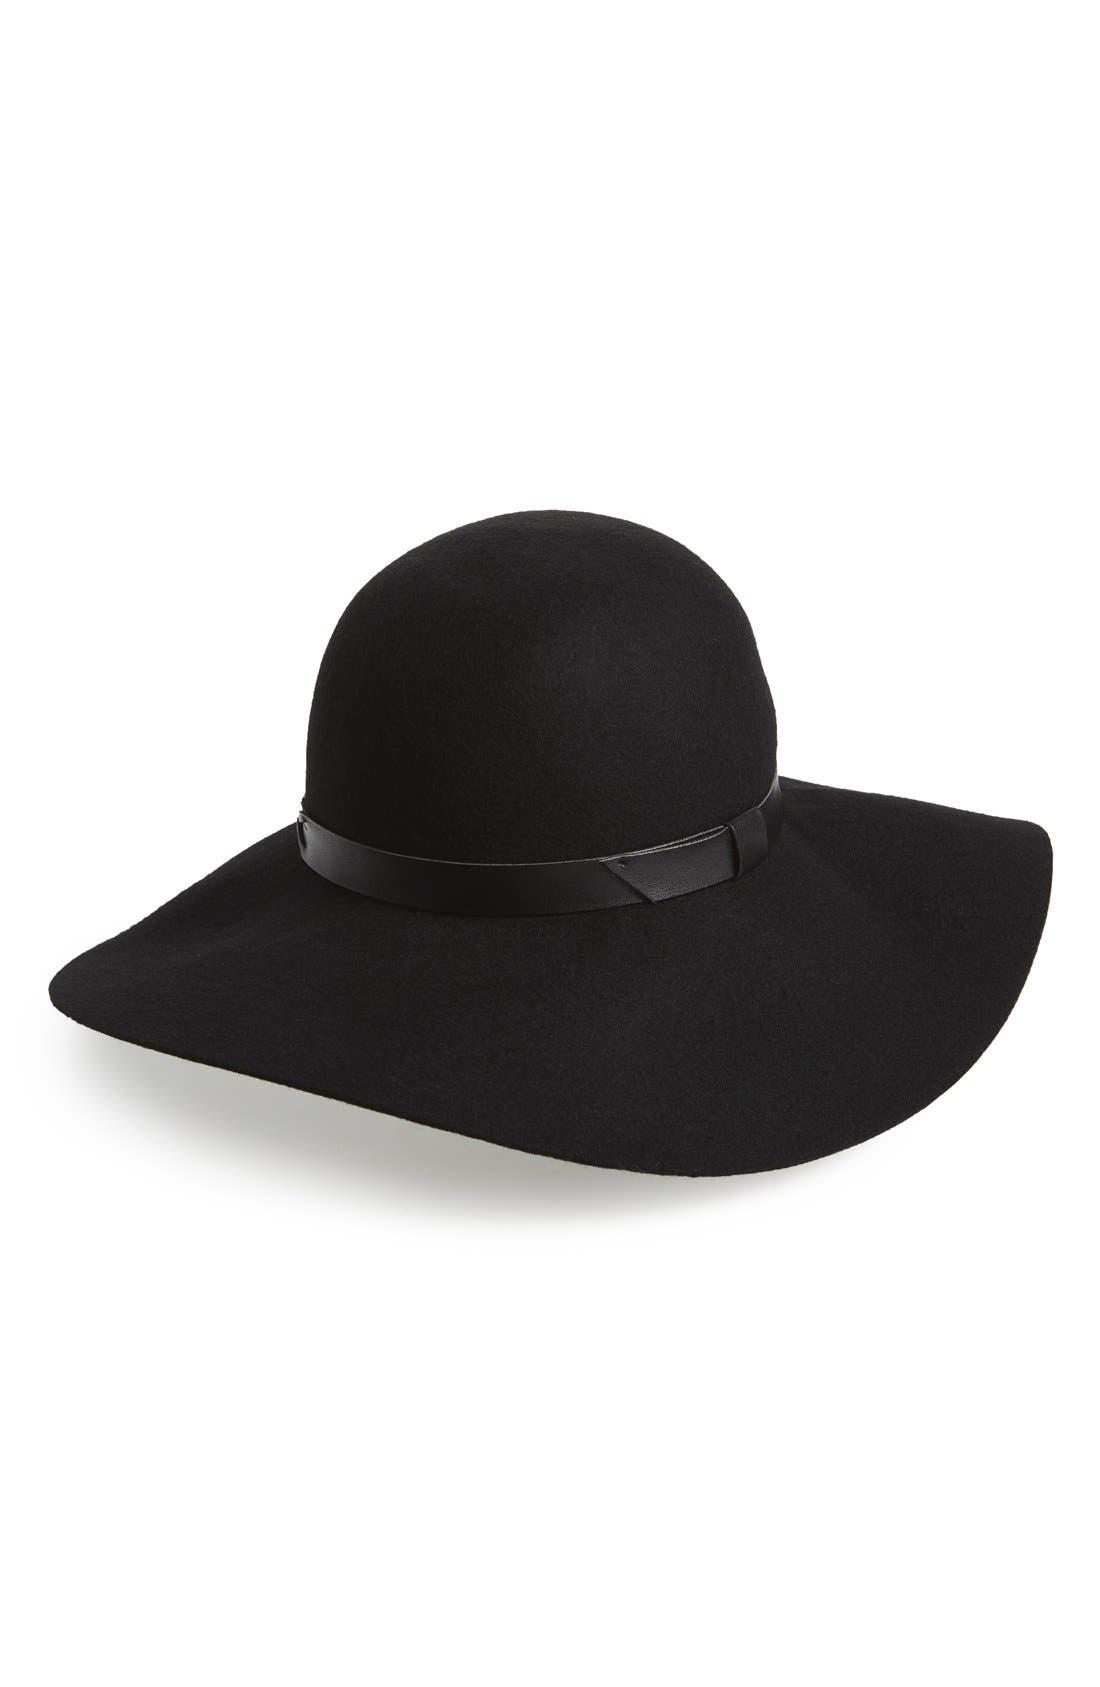 Floppy Wool Felt Hat,                             Main thumbnail 1, color,                             001